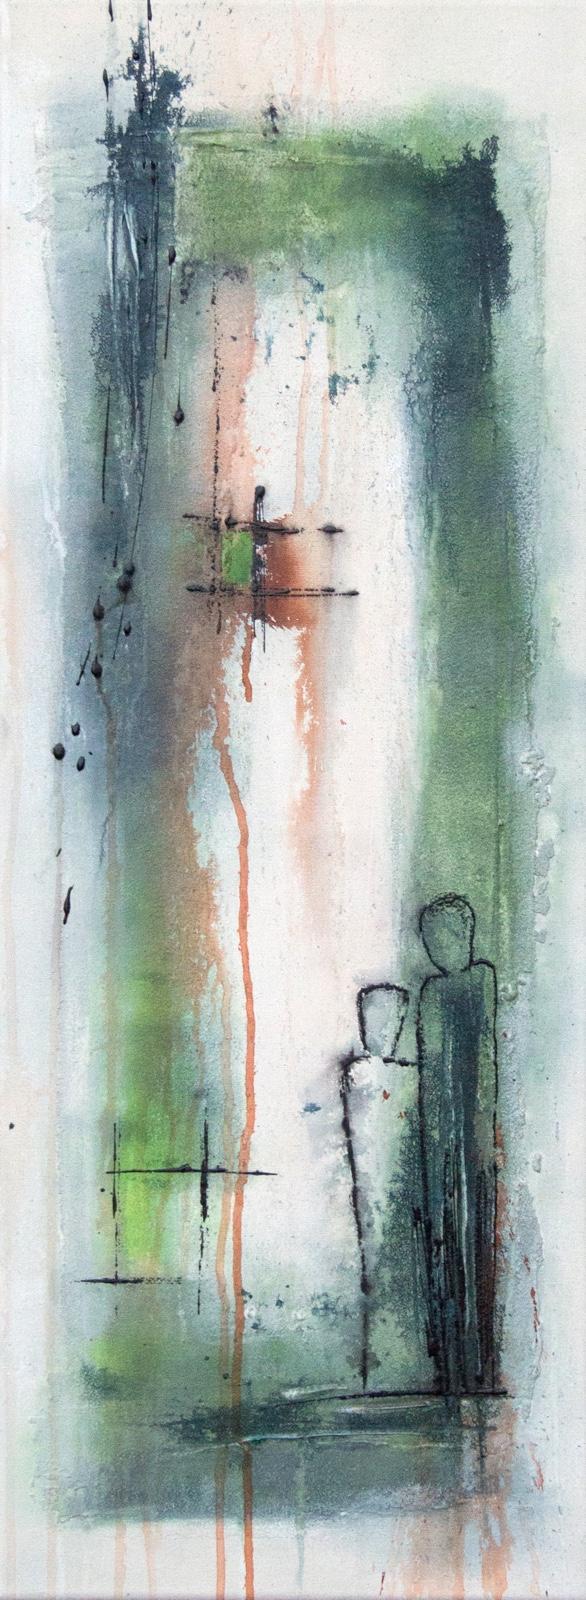 Jade Art 017